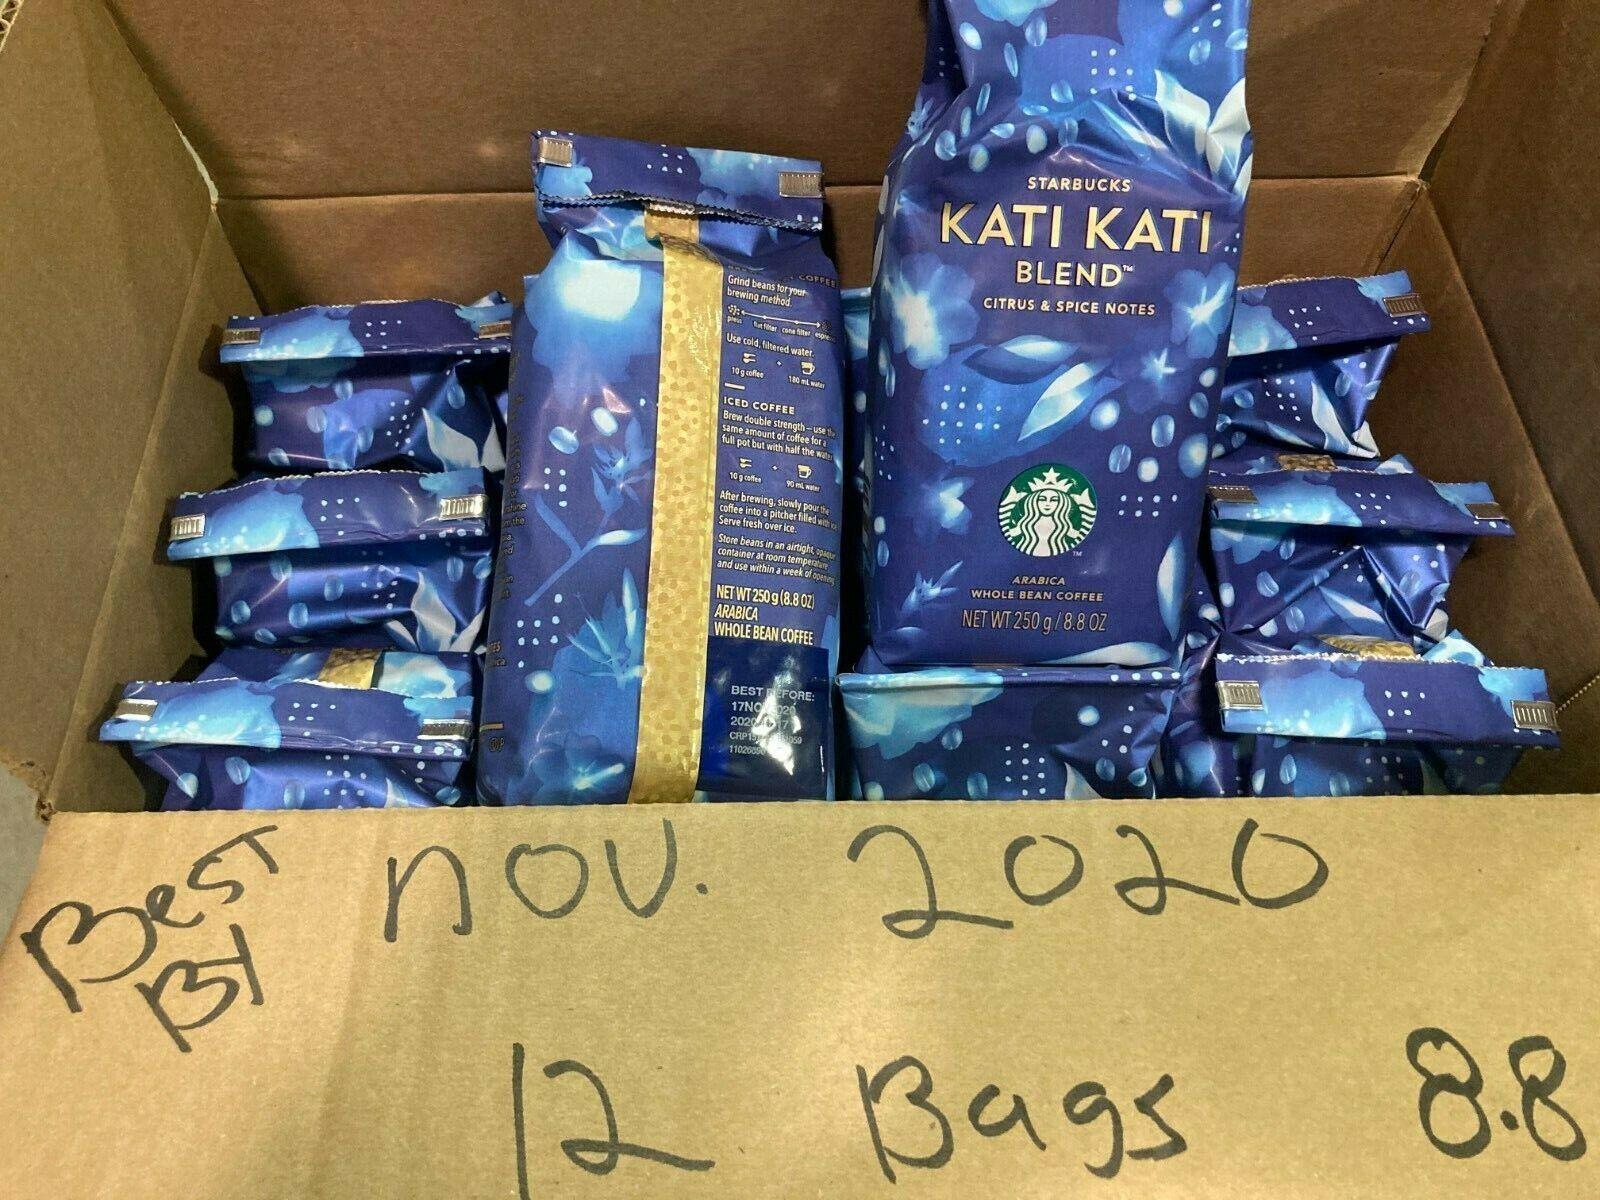 Lot Of 12/8.8 Oz Starbucks Reserve Kati Kati Whole Bean Coffee Best By NOV 2020 - $22.50